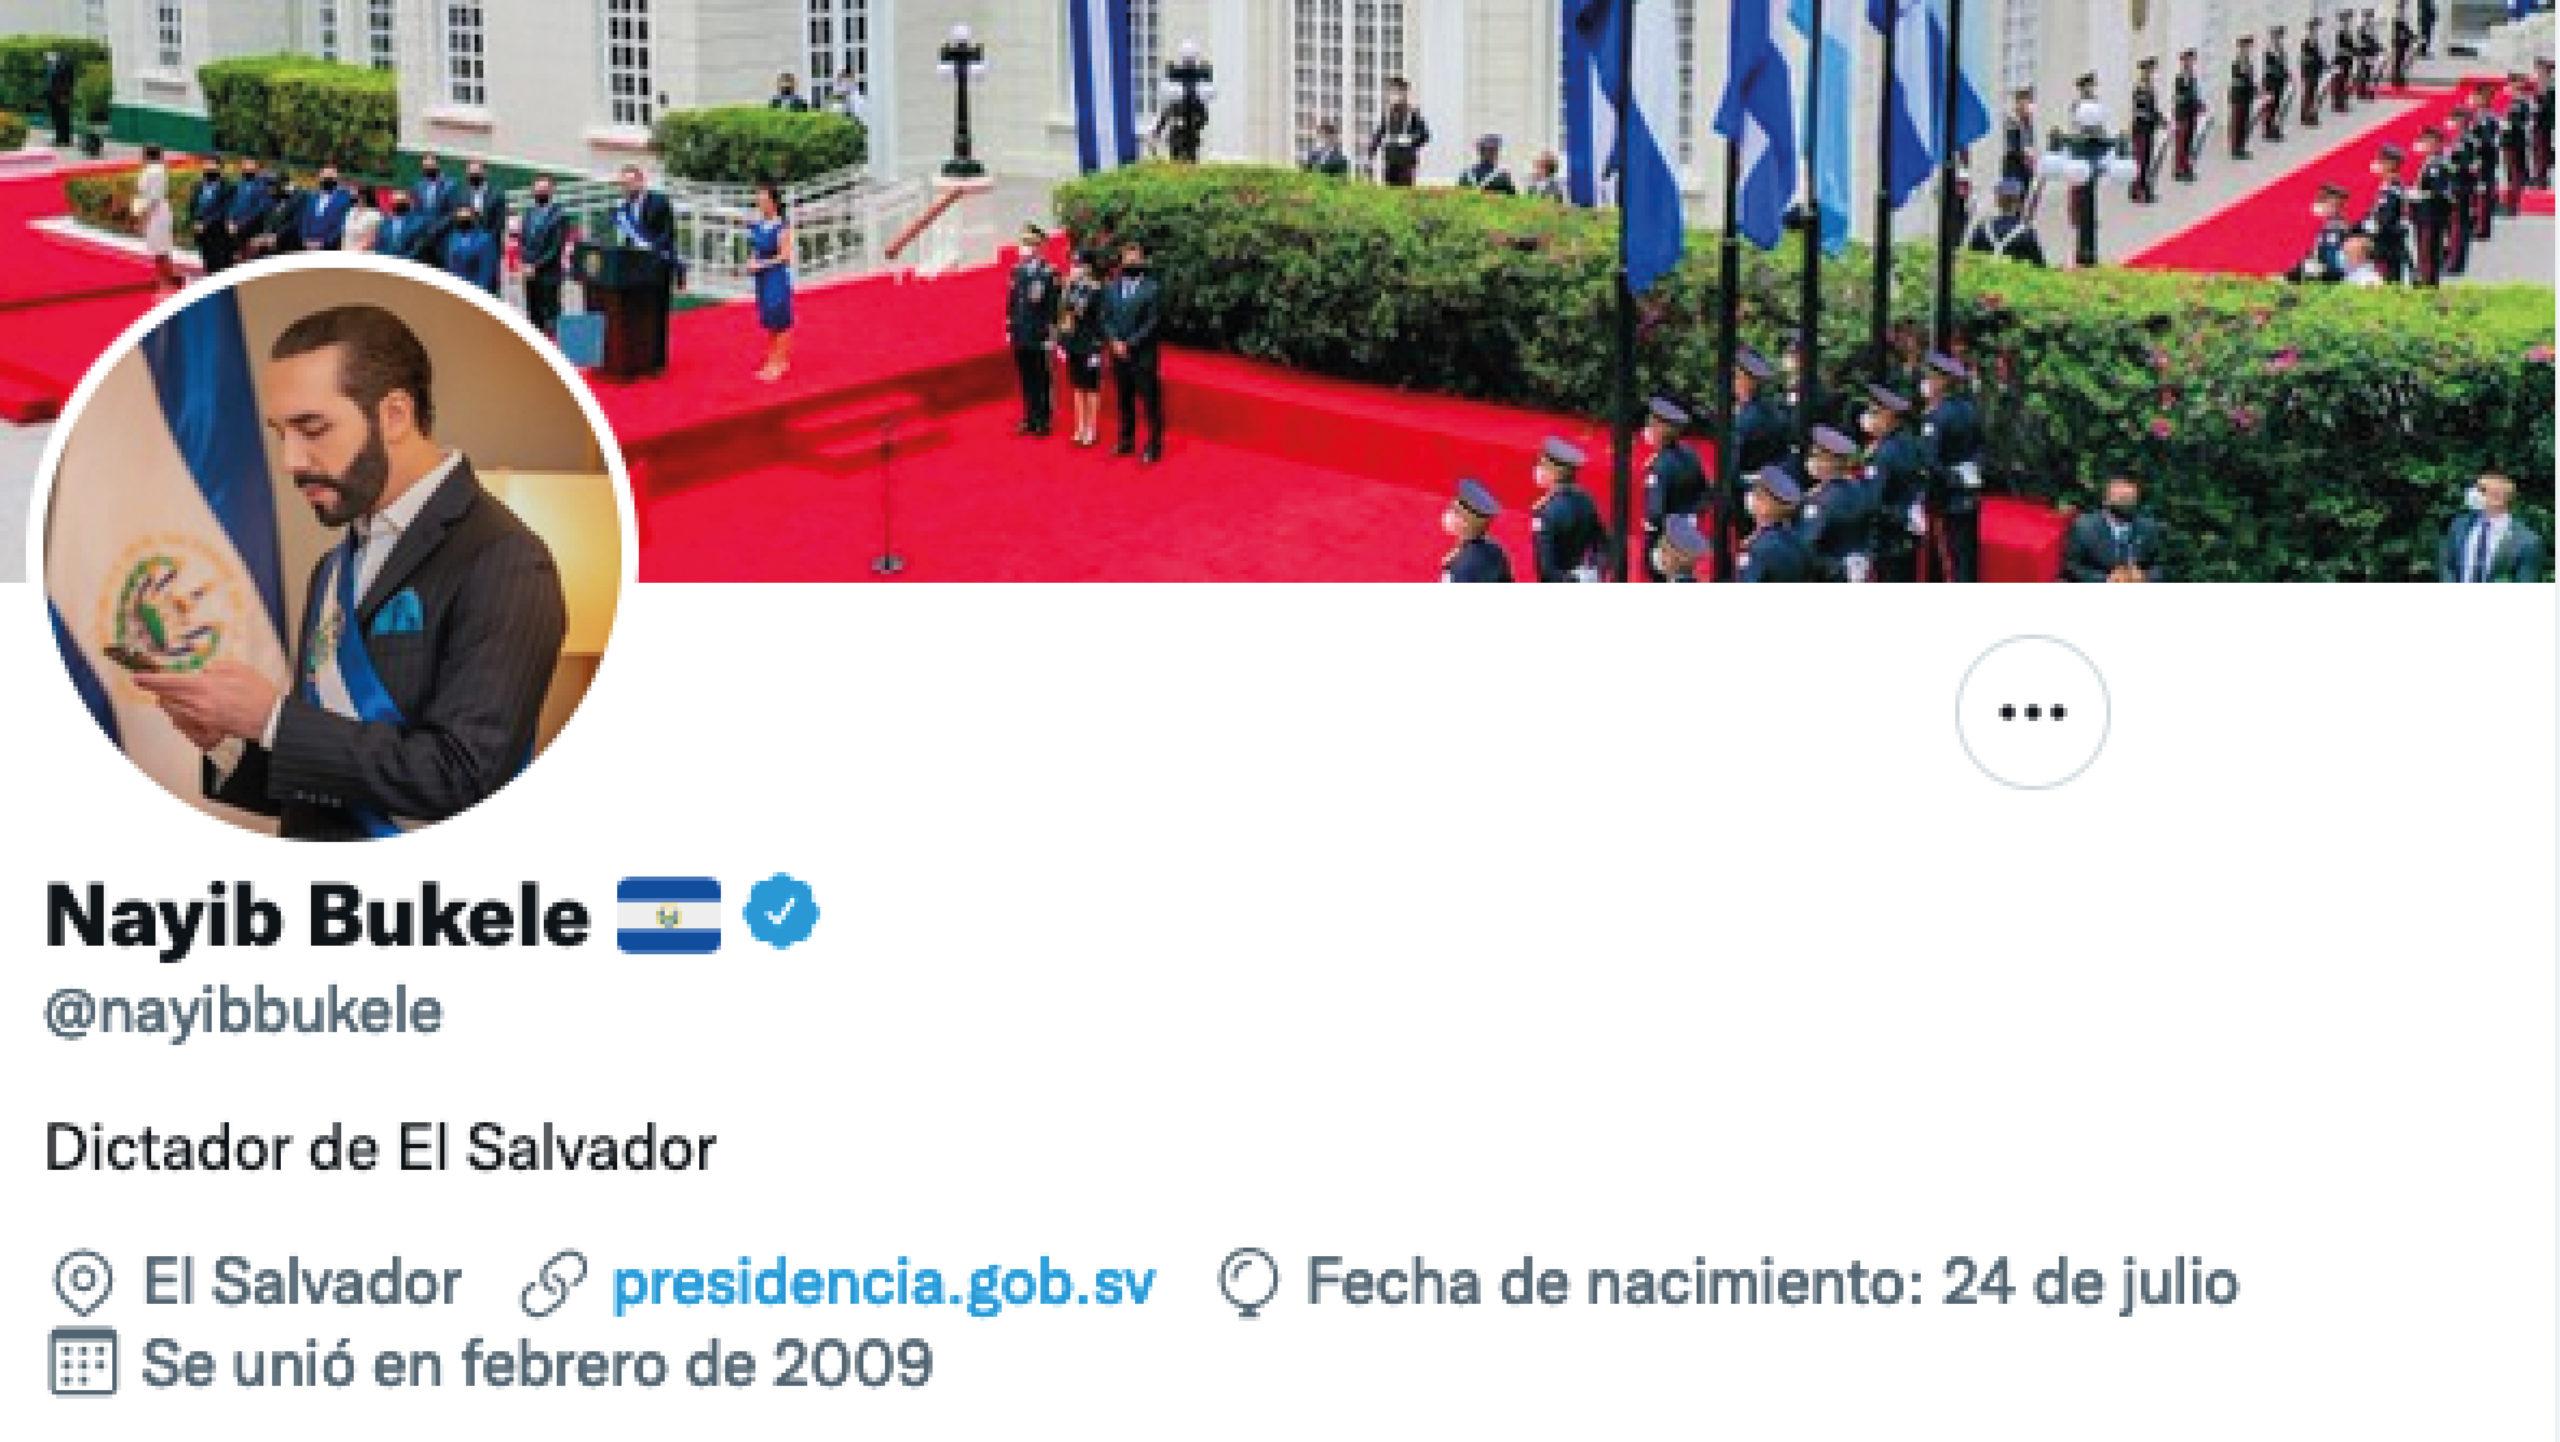 Nayib Bukele se describe en Twitter como 'dictador de El Salvador'